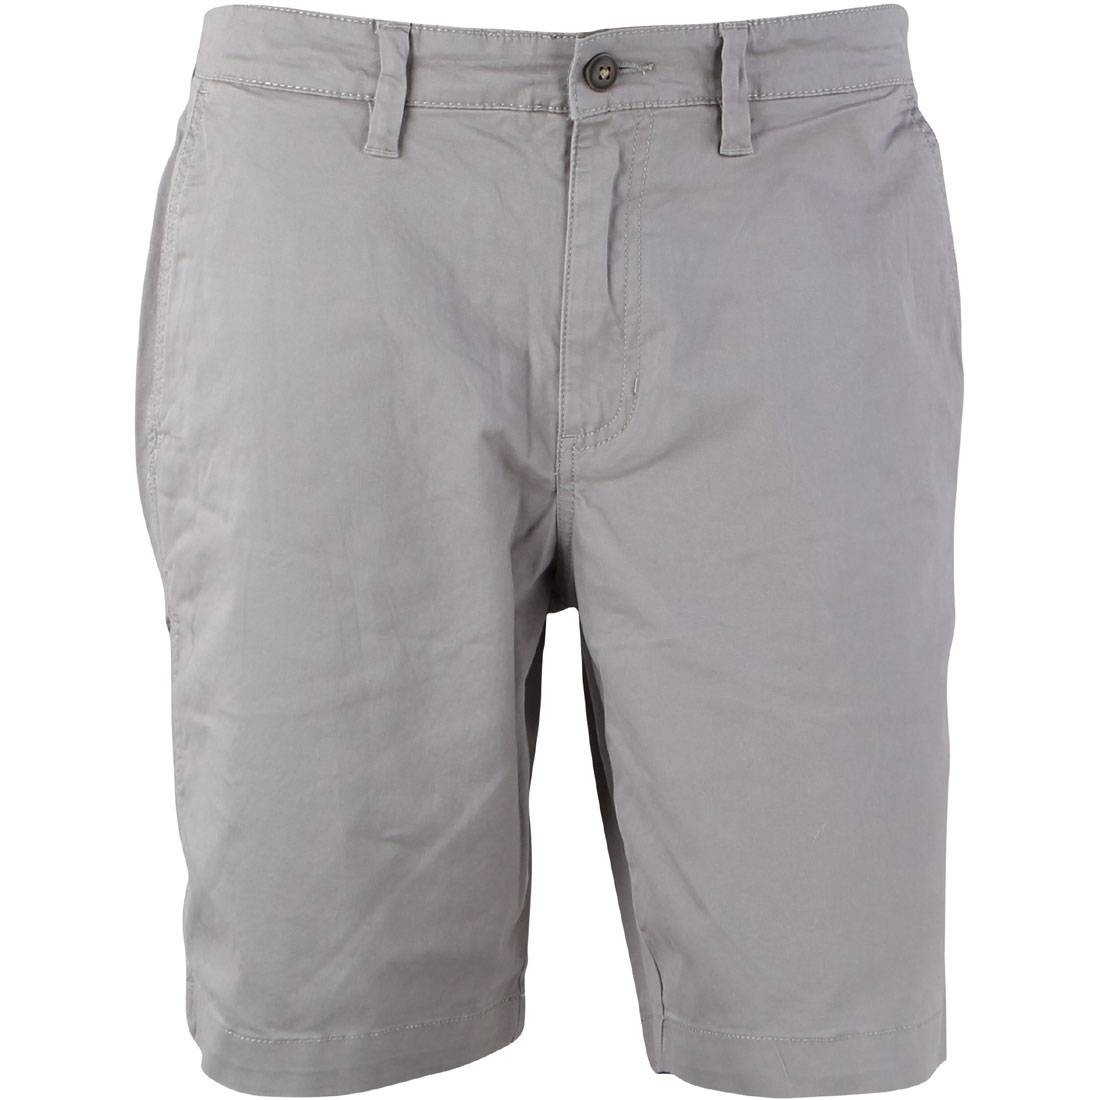 Vans Men Bedford Shorts (gray / frost)